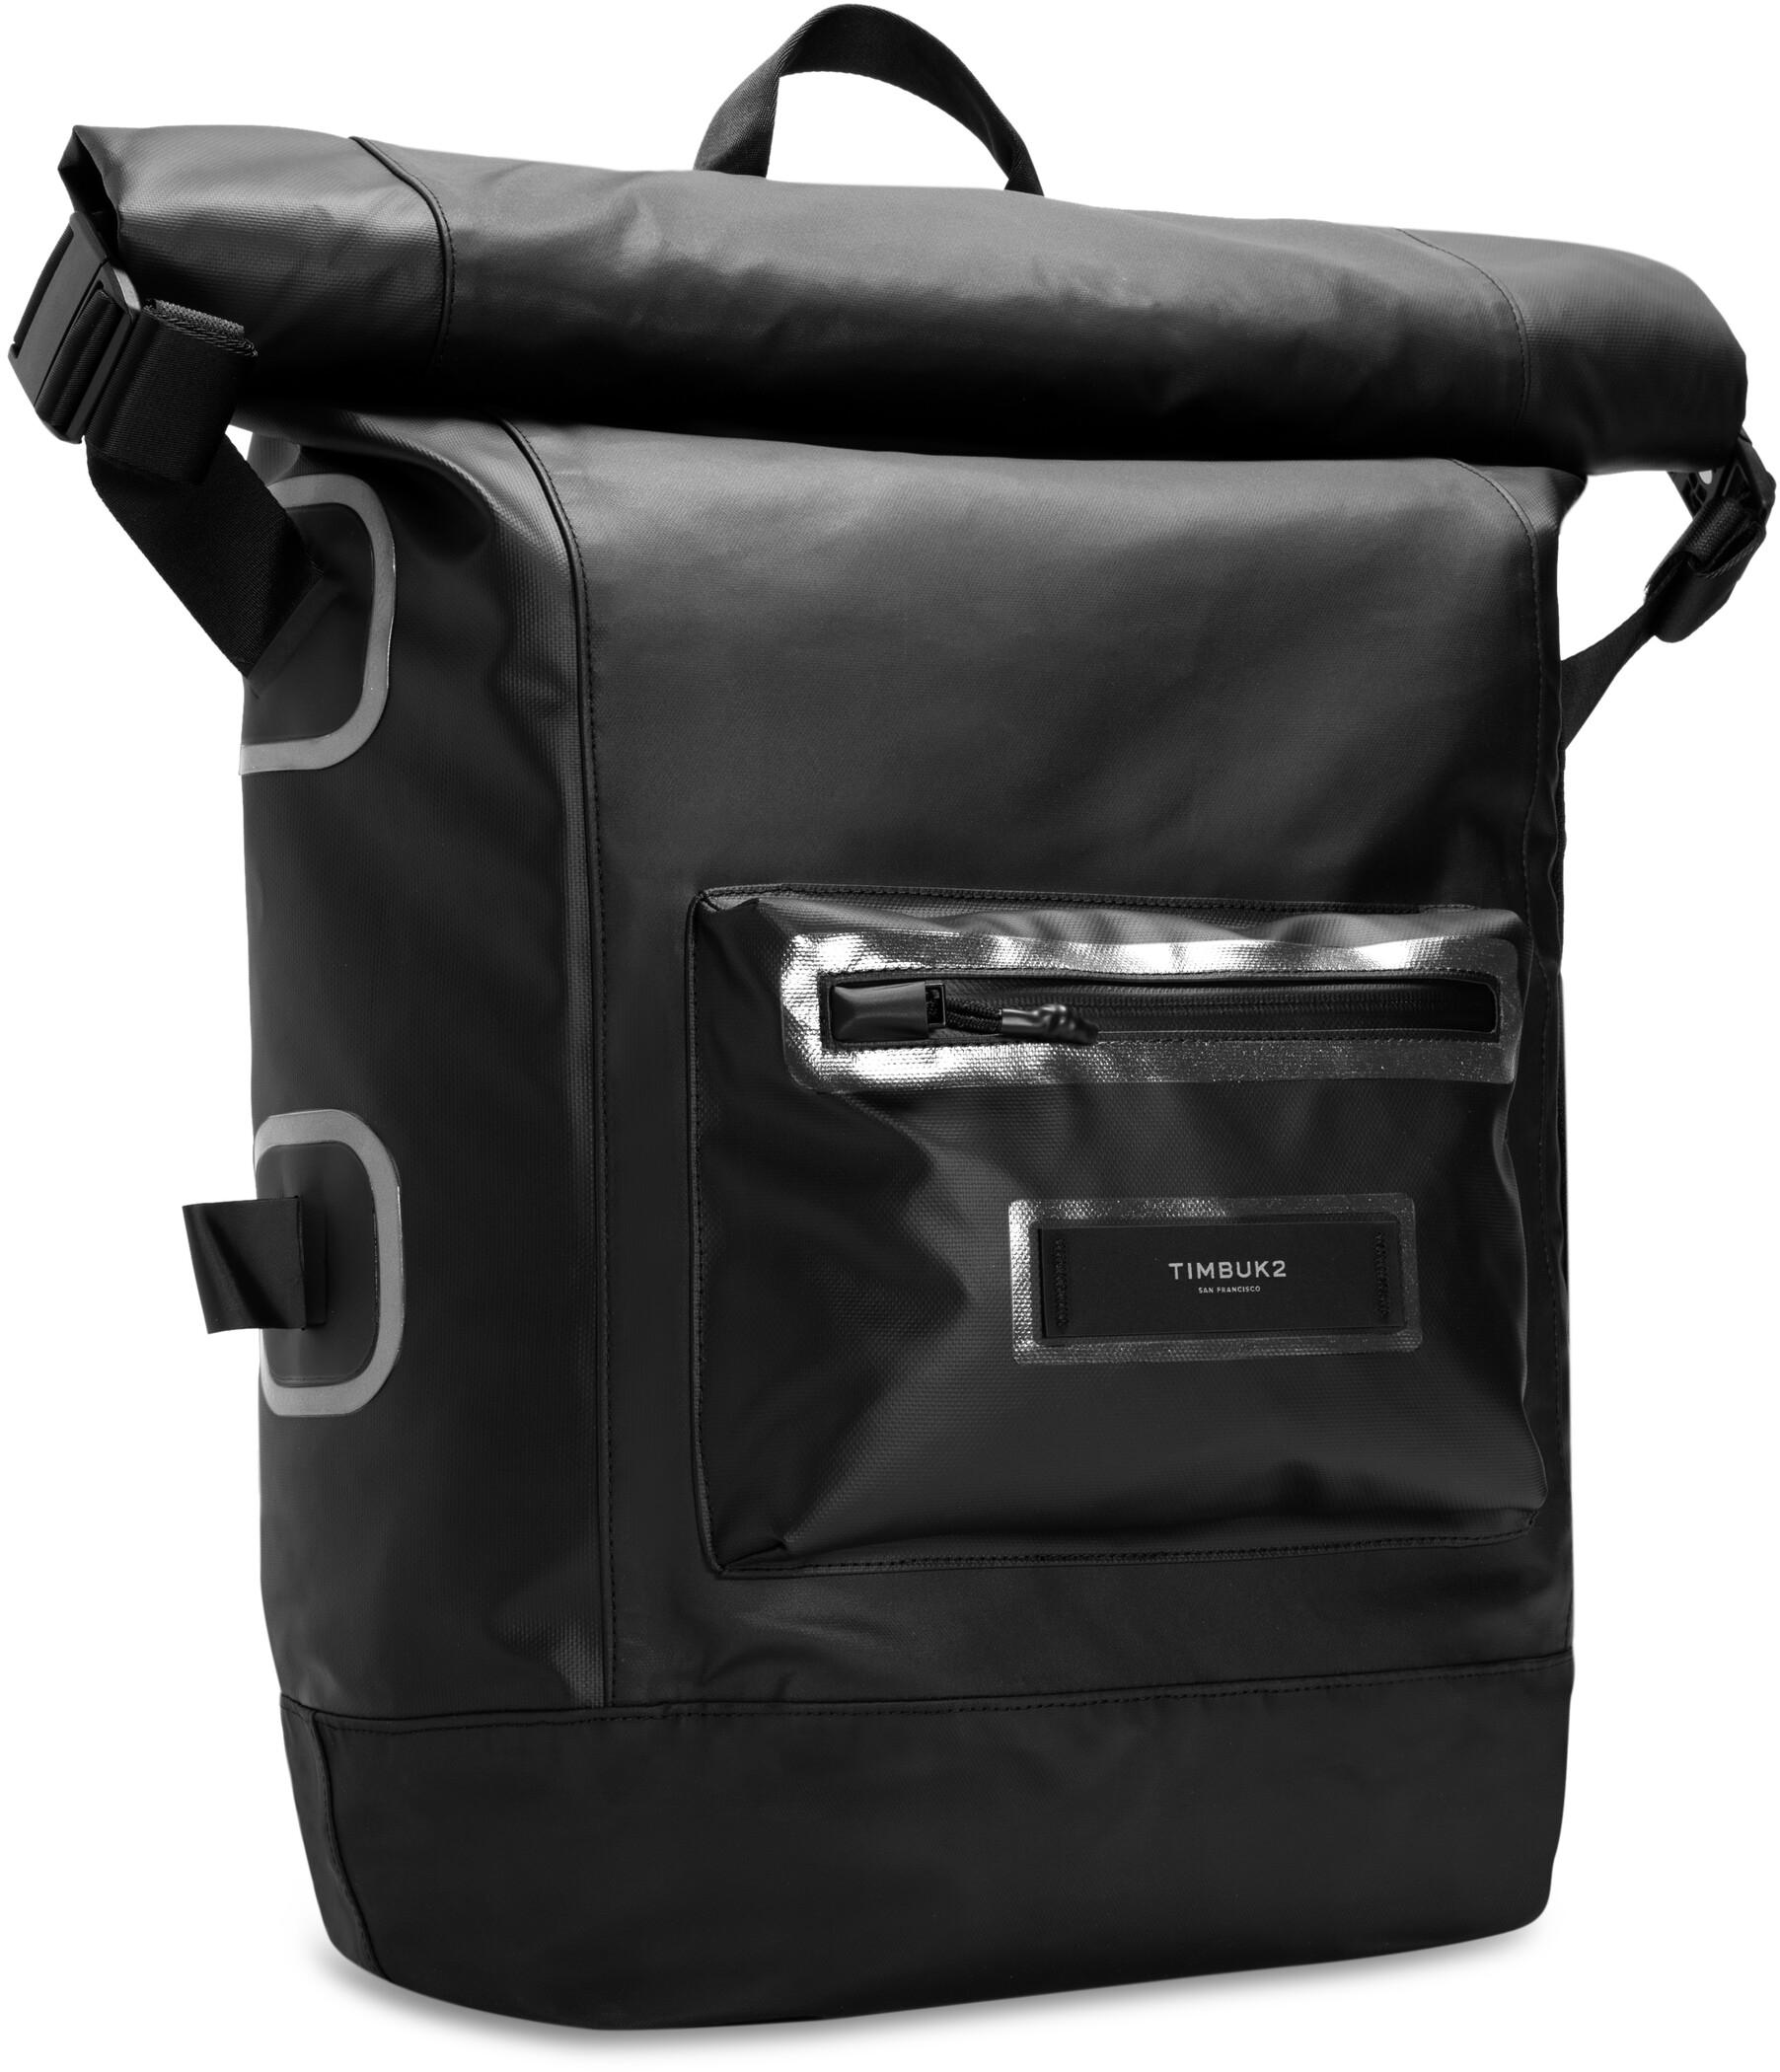 UNI gelb SALEWA Regenh/üllen Raincover For Backpacks 35-55L